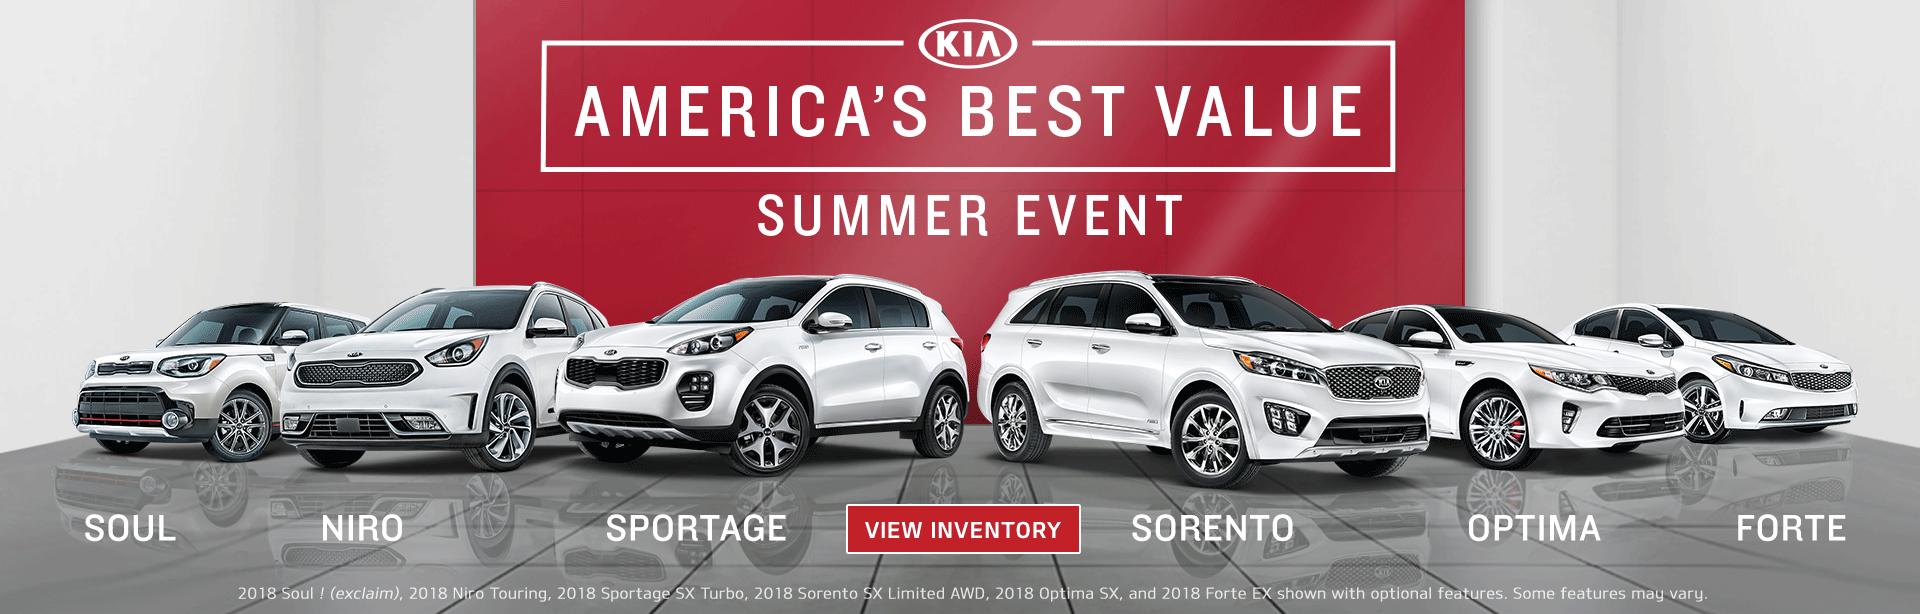 America's Best Value Summer Event at Beaverton Kia